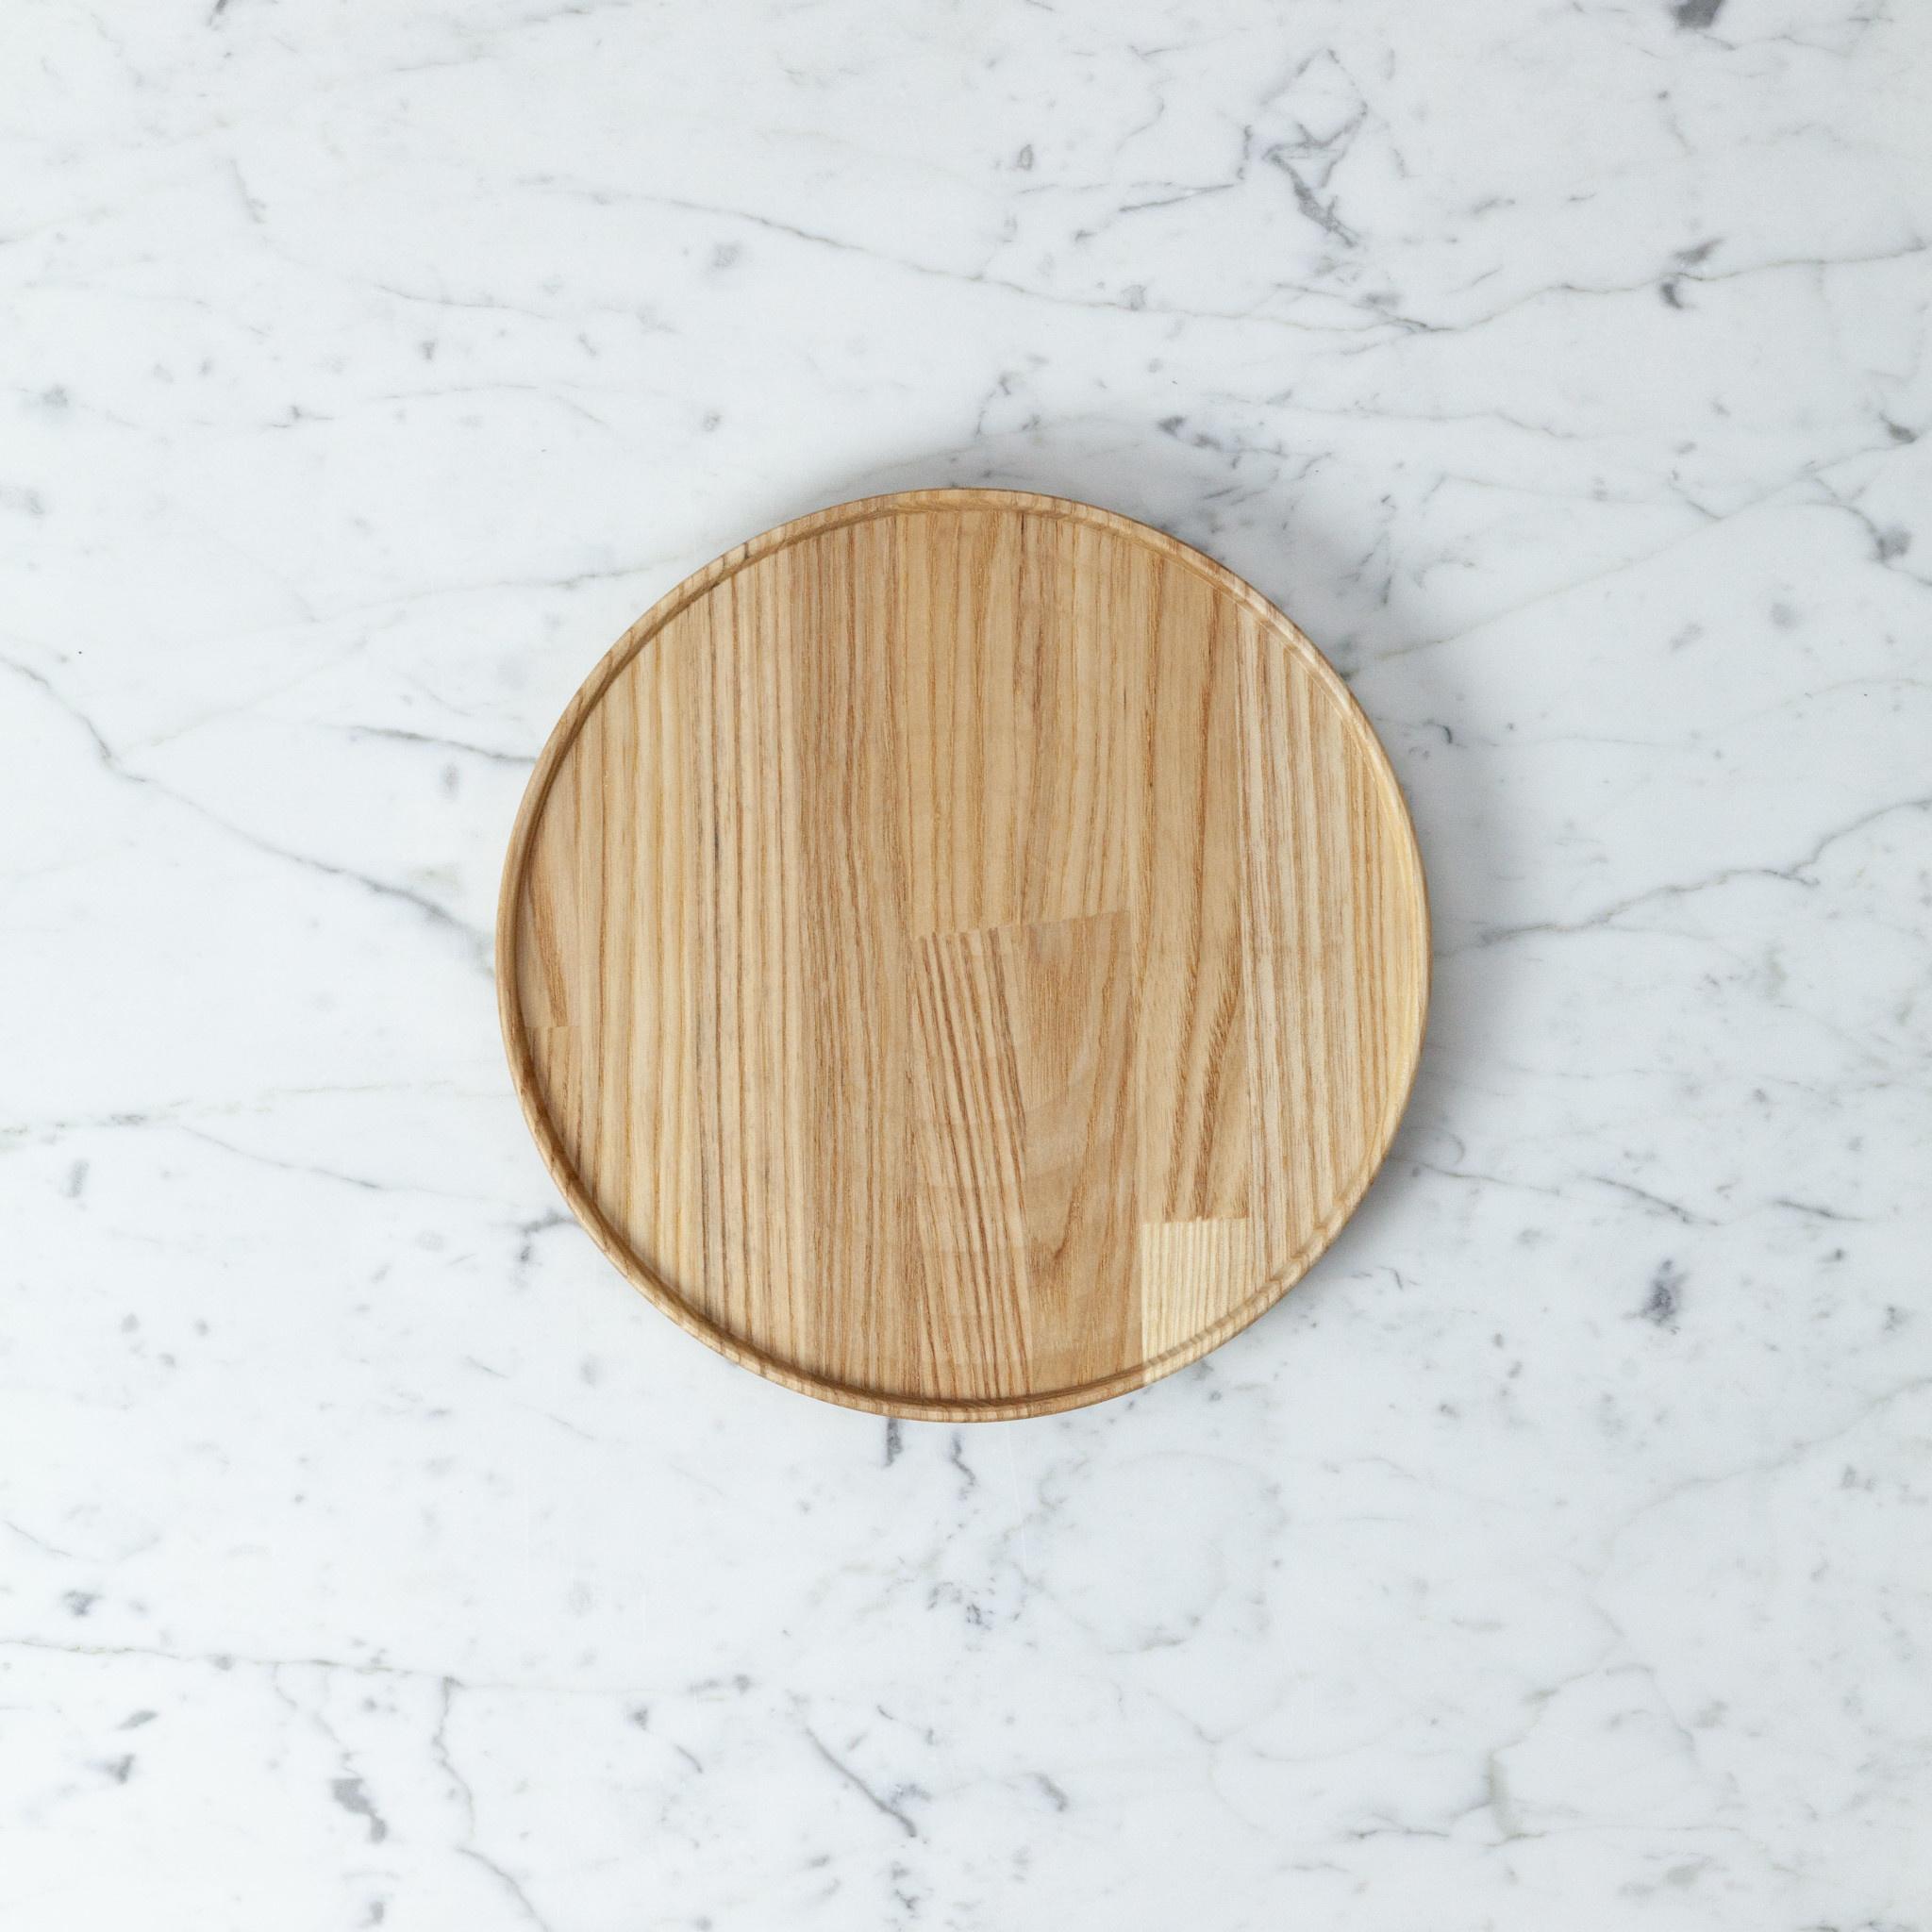 "PREORDER Hasami Ash Wood Round Tray - Medium - 8 1/2"" x 3/4"""